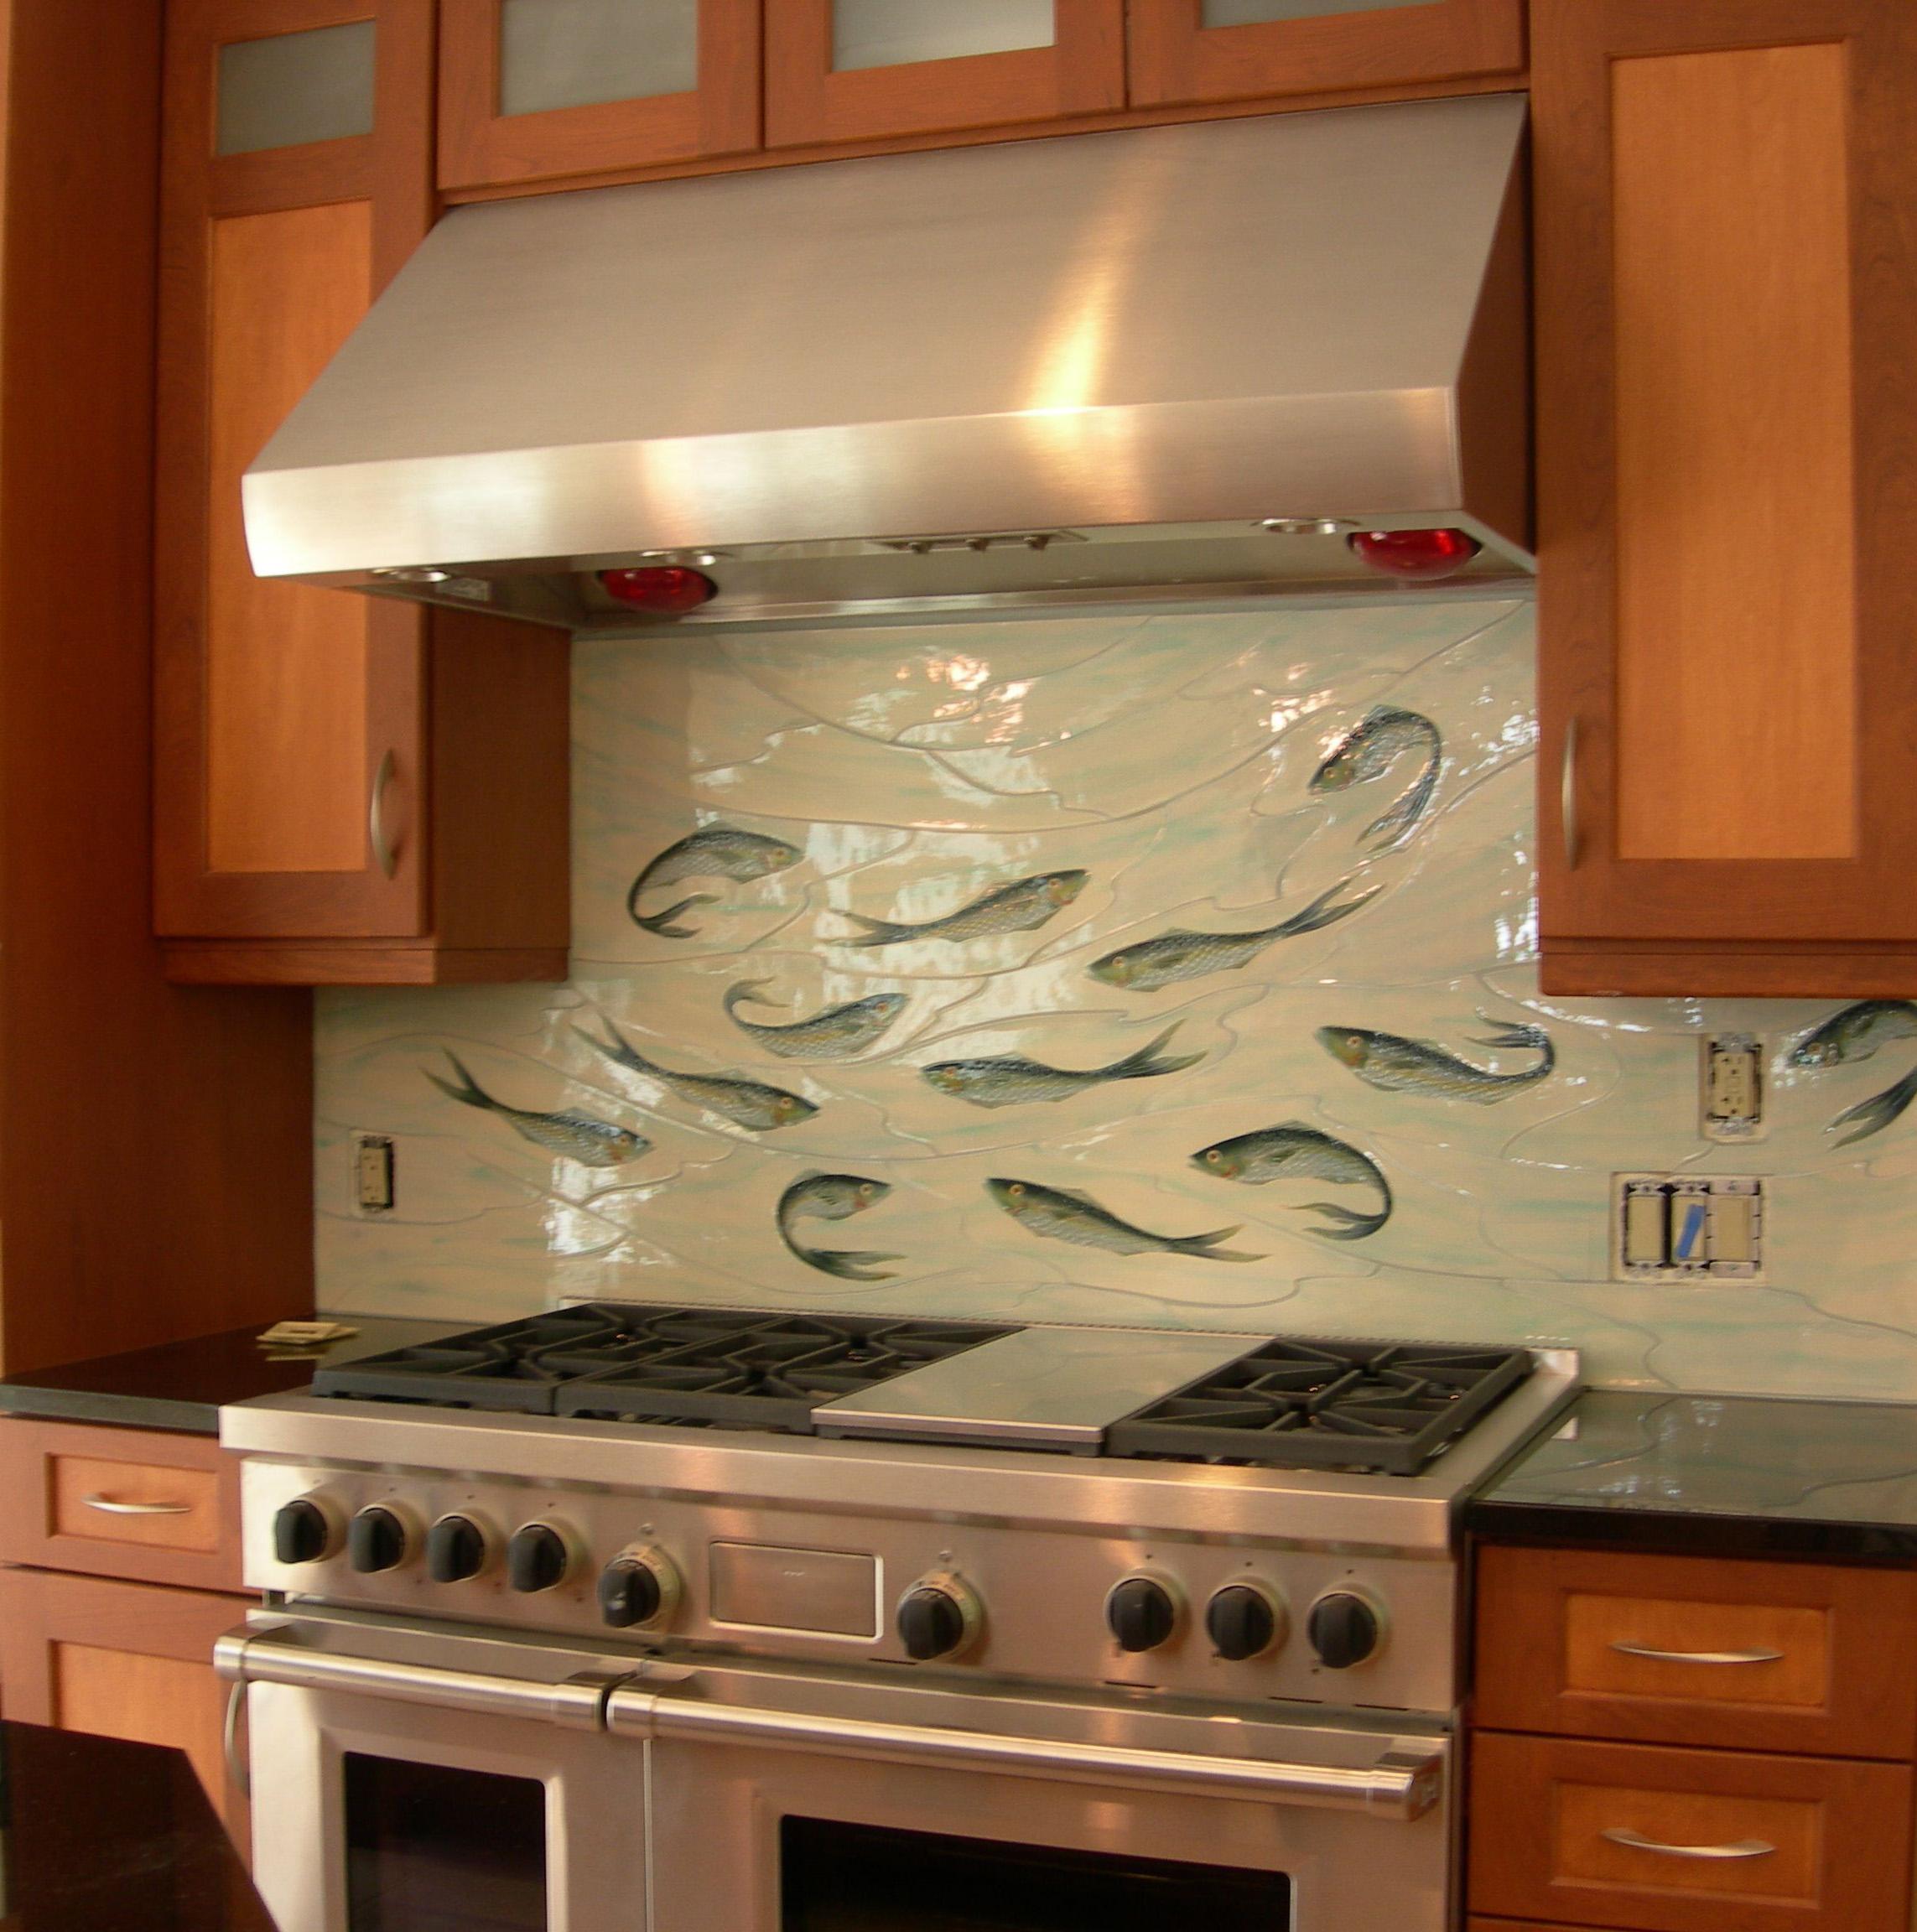 School of fish Kitchen